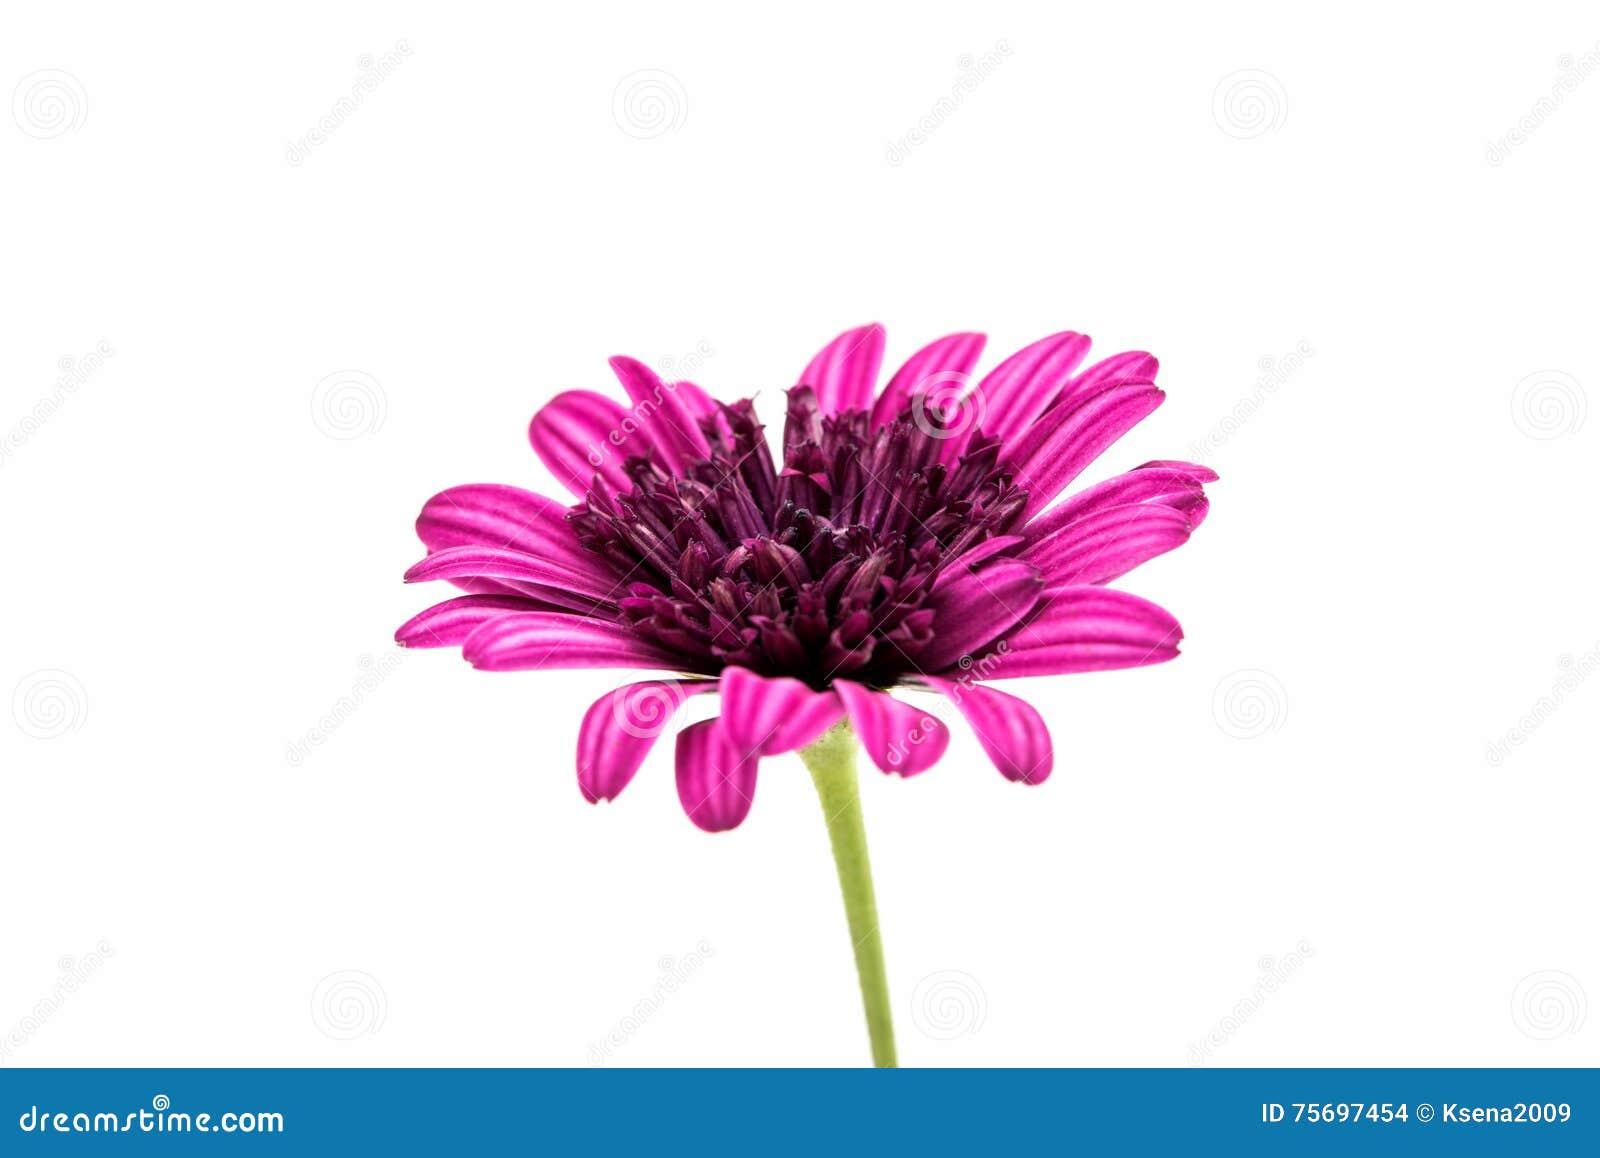 Purple chrysanthemum flower daisy family stock photo image of purple chrysanthemum flower daisy family isolated on white background izmirmasajfo